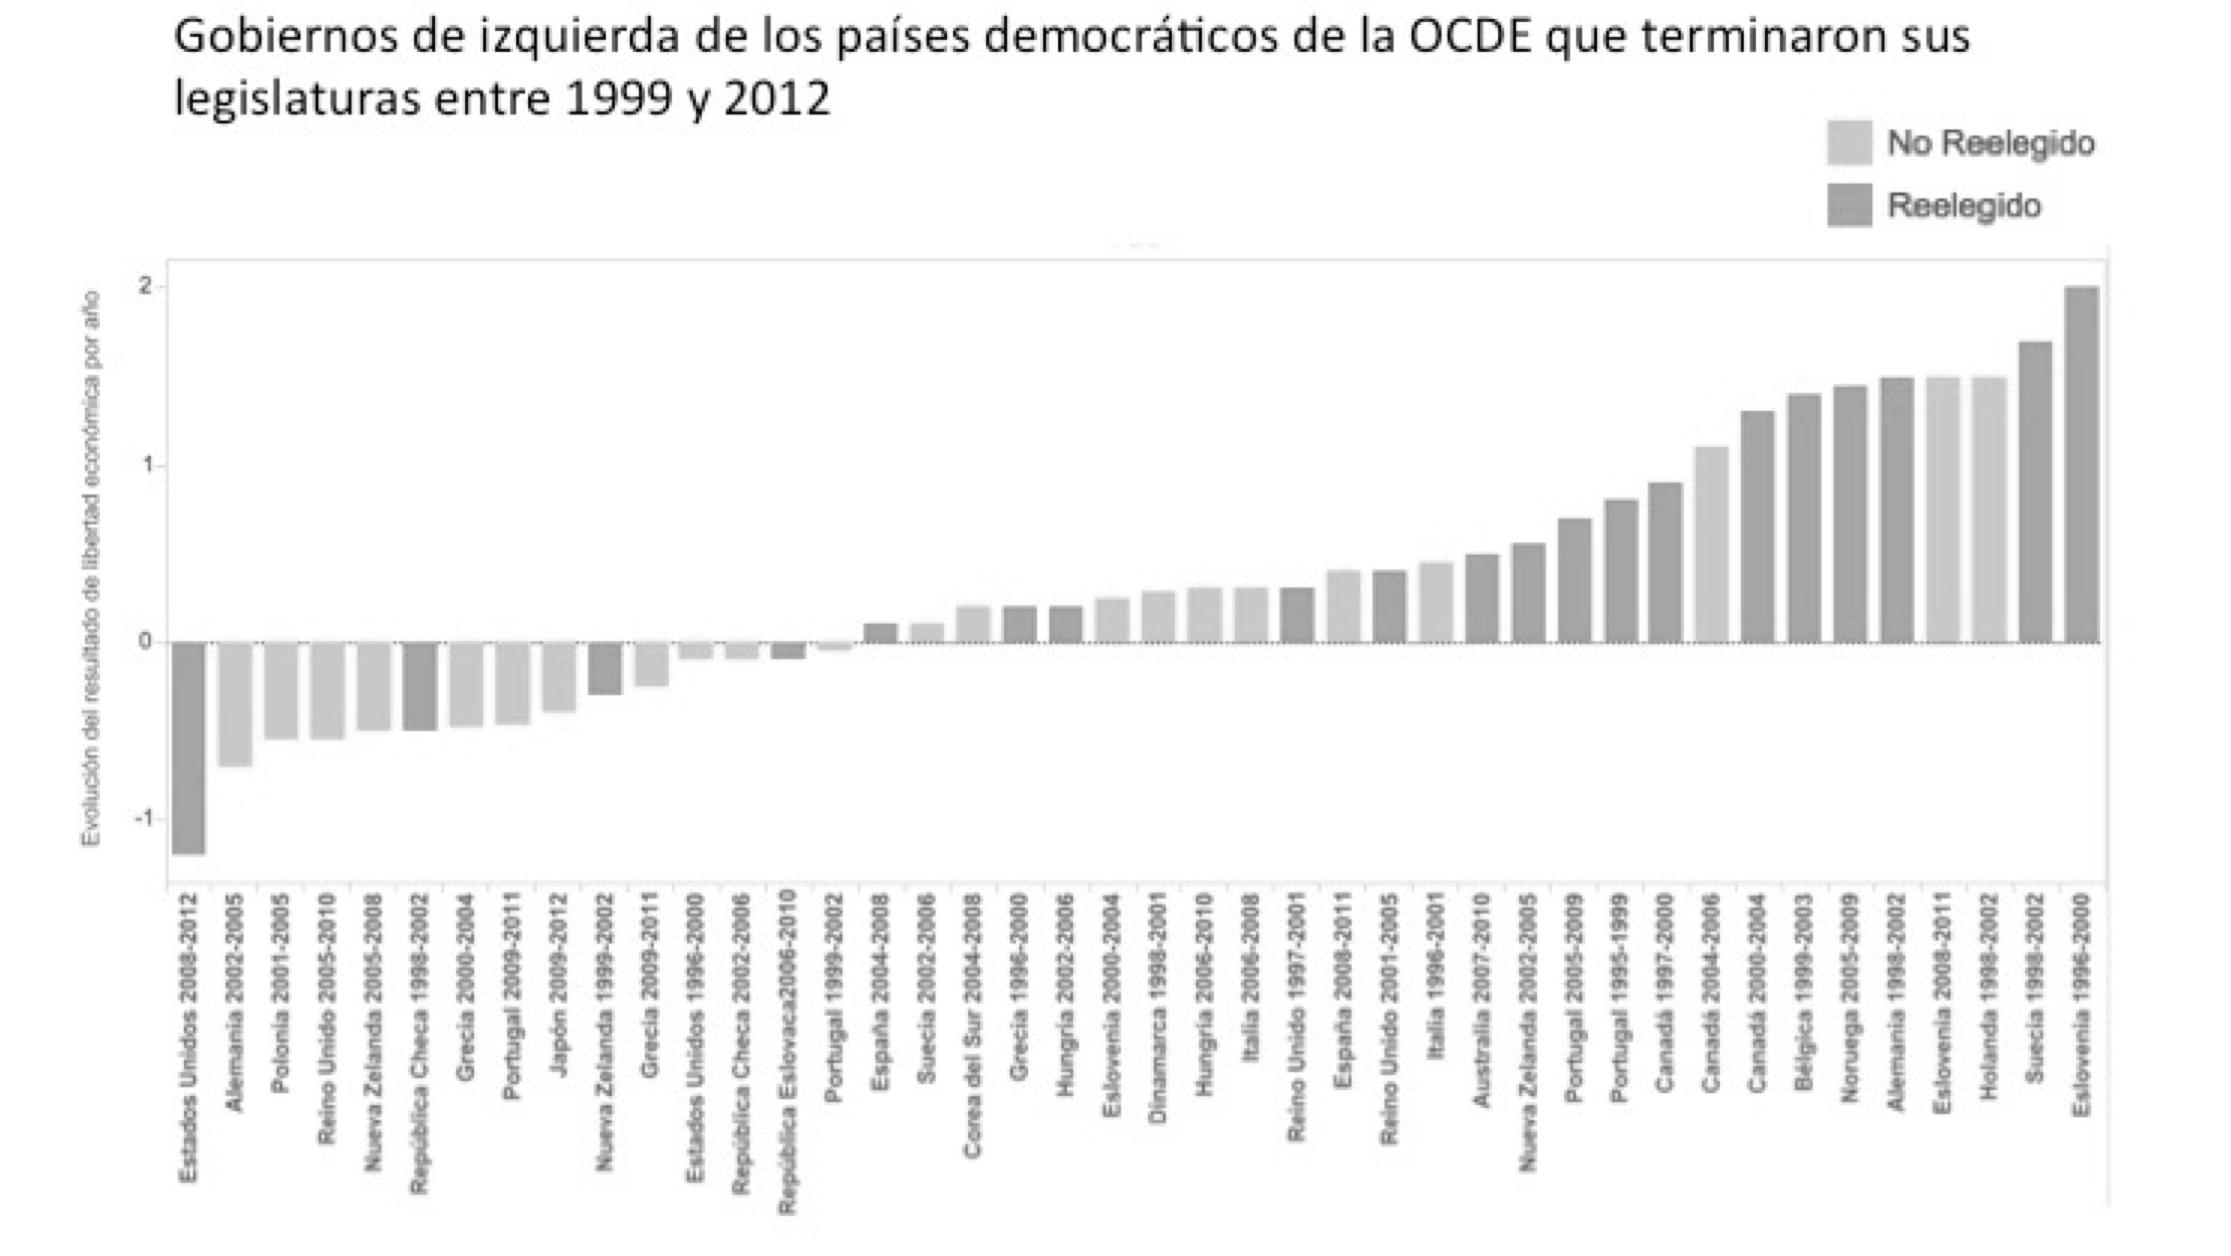 Reformas-liberales-1-izquierda.png